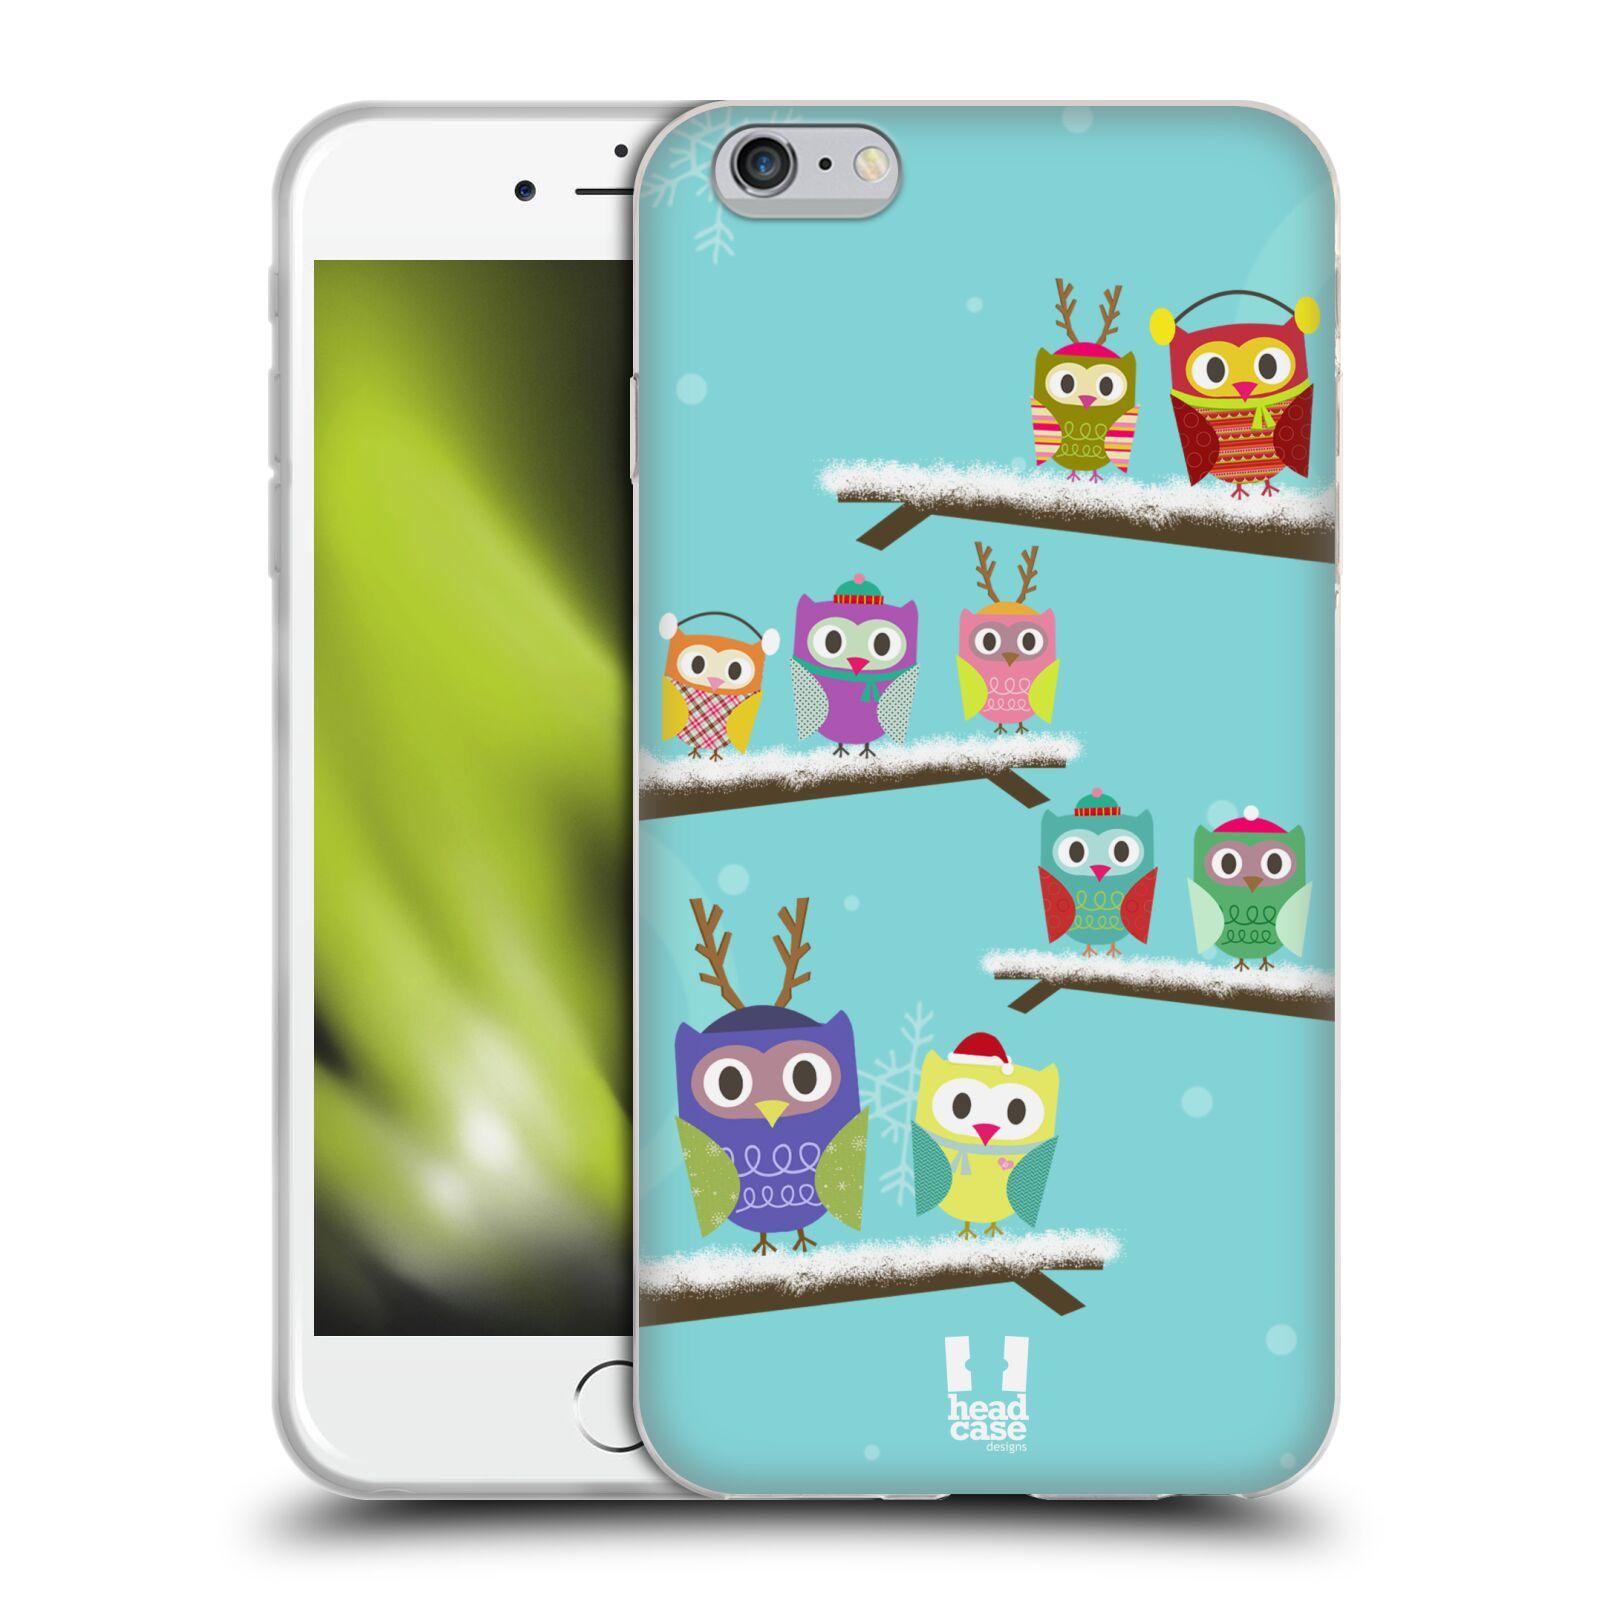 HEAD CASE silikonový obal na mobil Apple Iphone 6 PLUS/ 6S PLUS vzor Zimní sovičky modrá